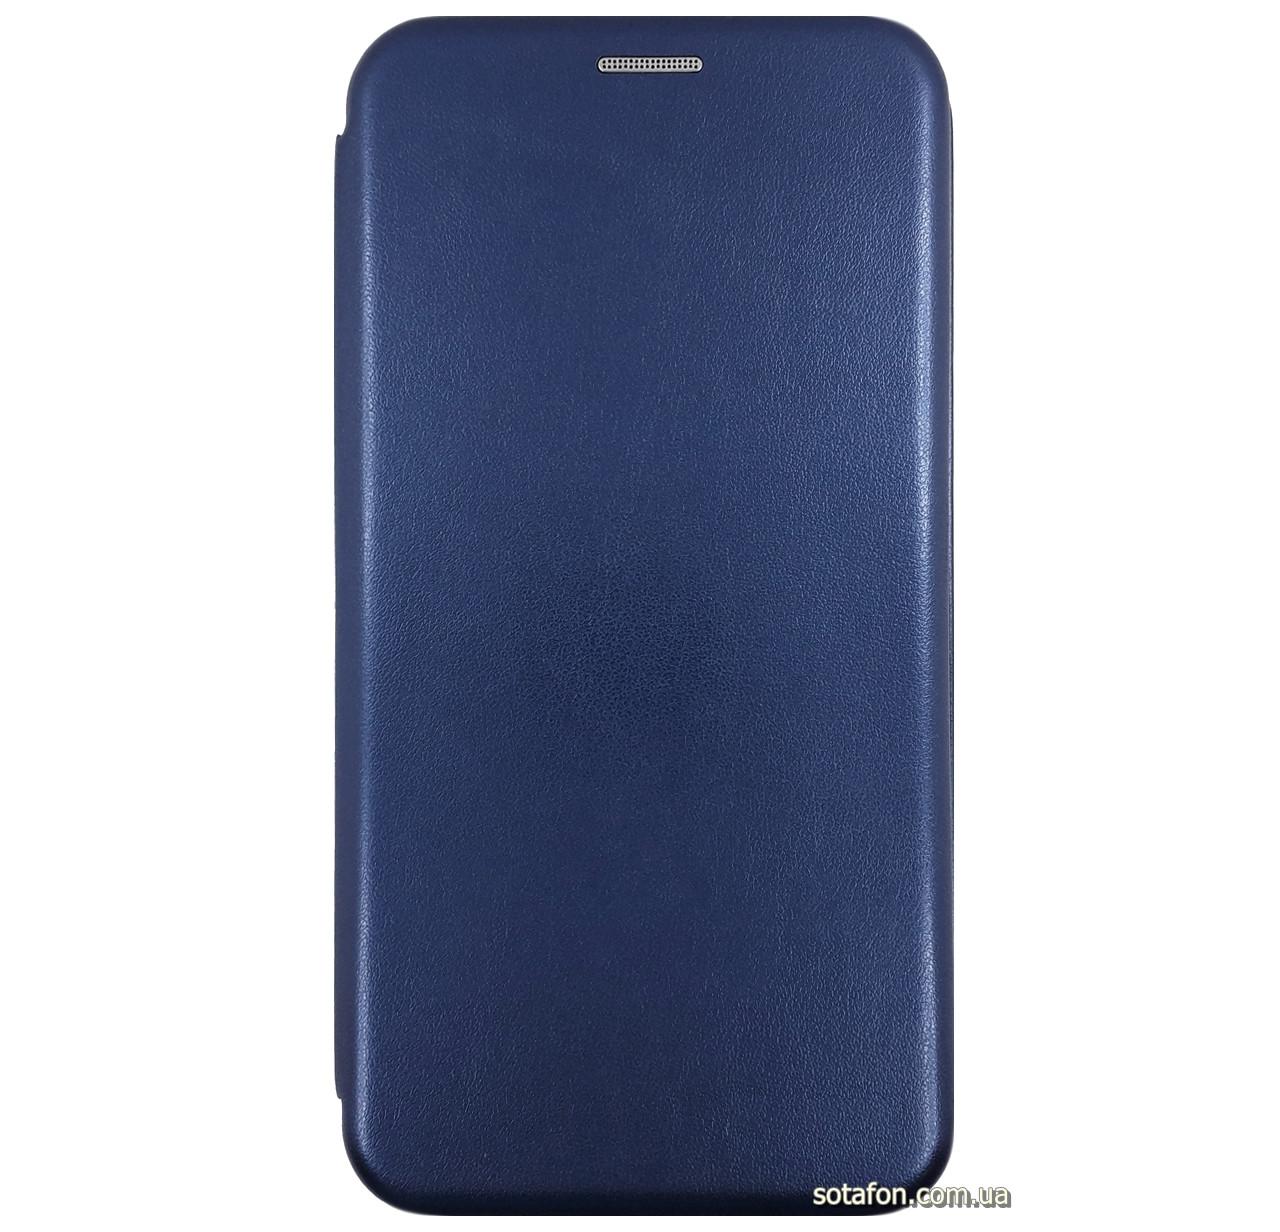 Чехол-книжка G-Case Ranger Series для Meizu M6t Blue